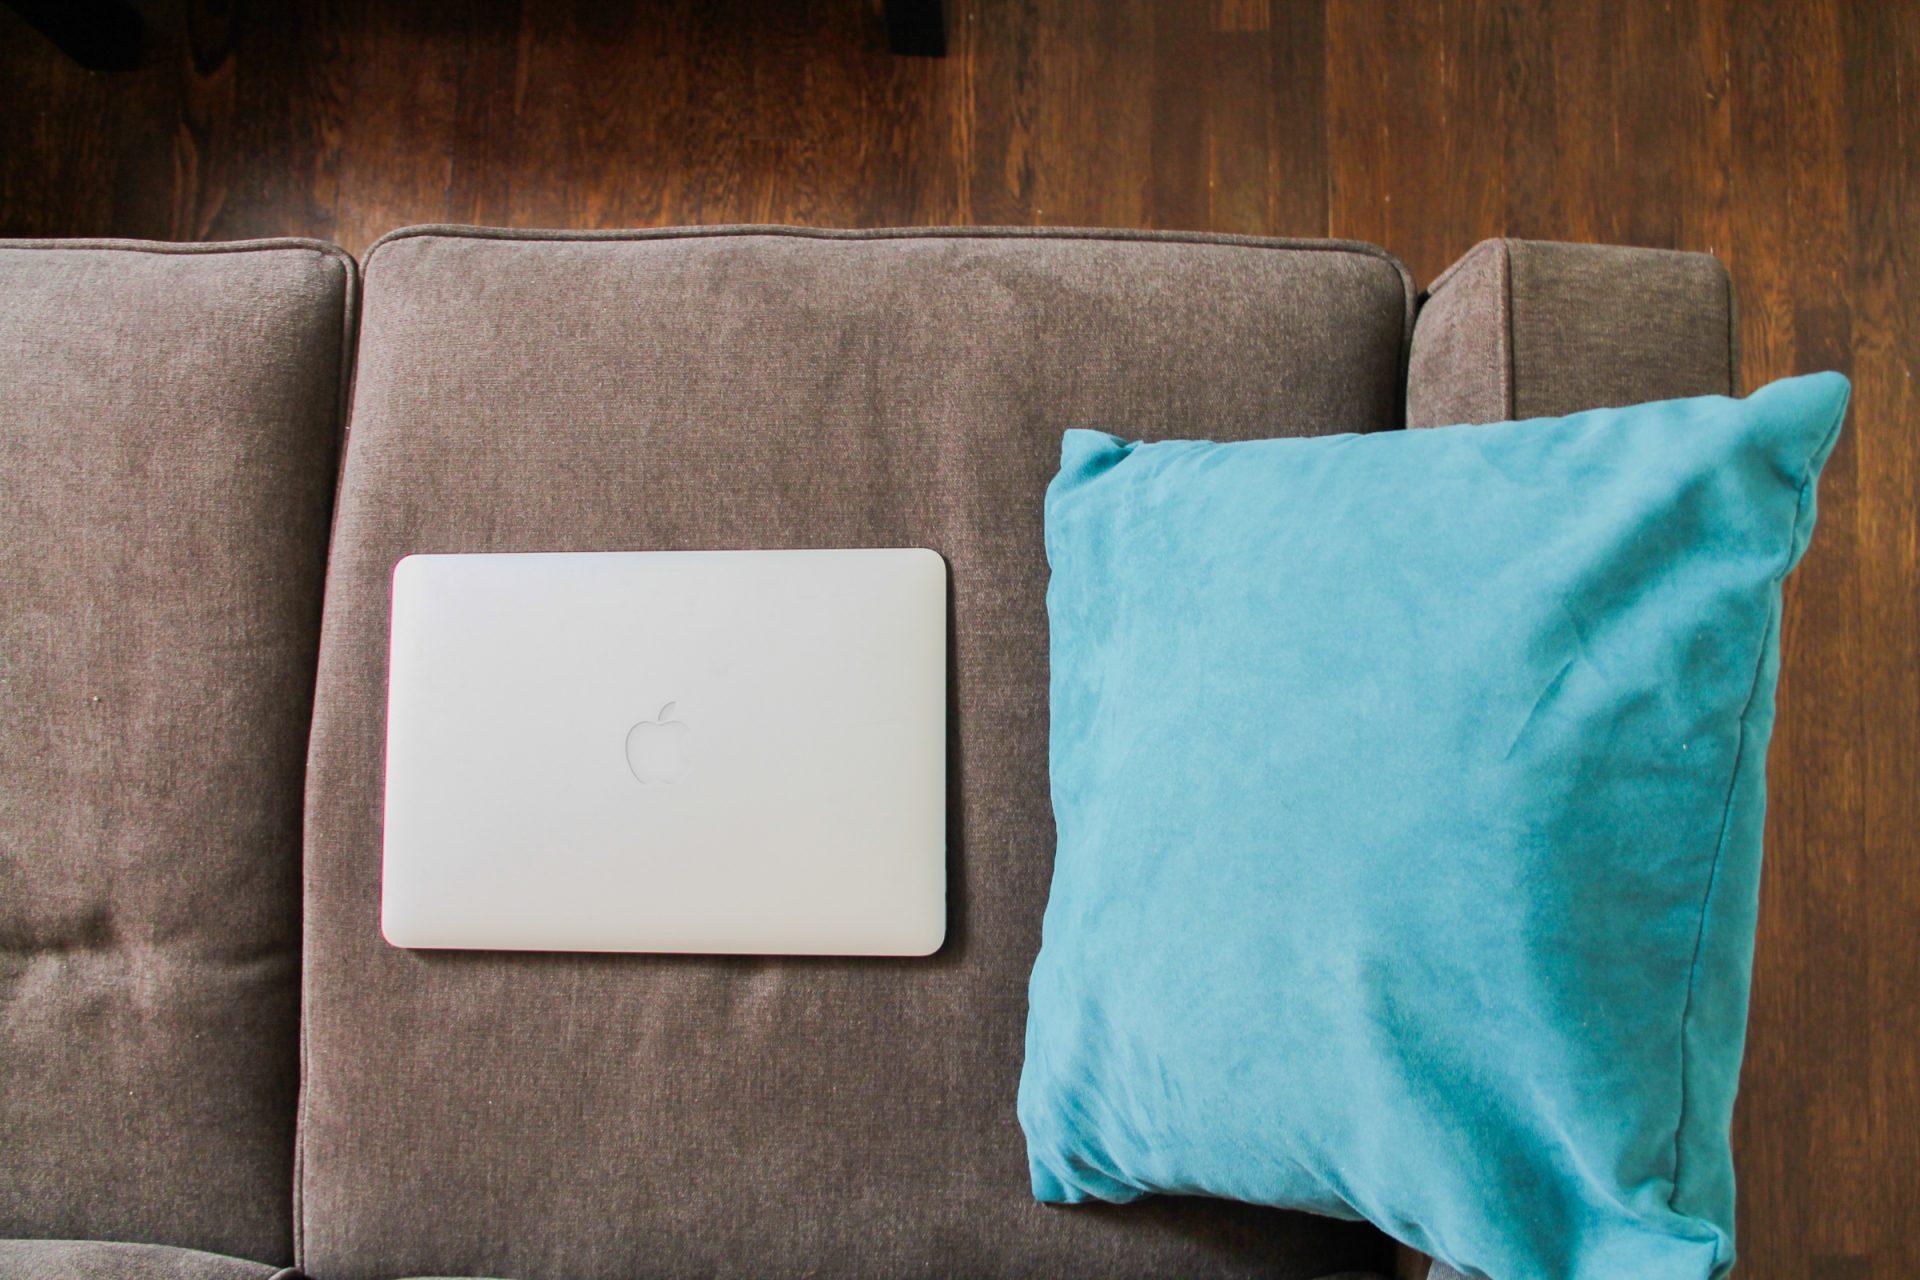 Macbook Laptop on Sofa